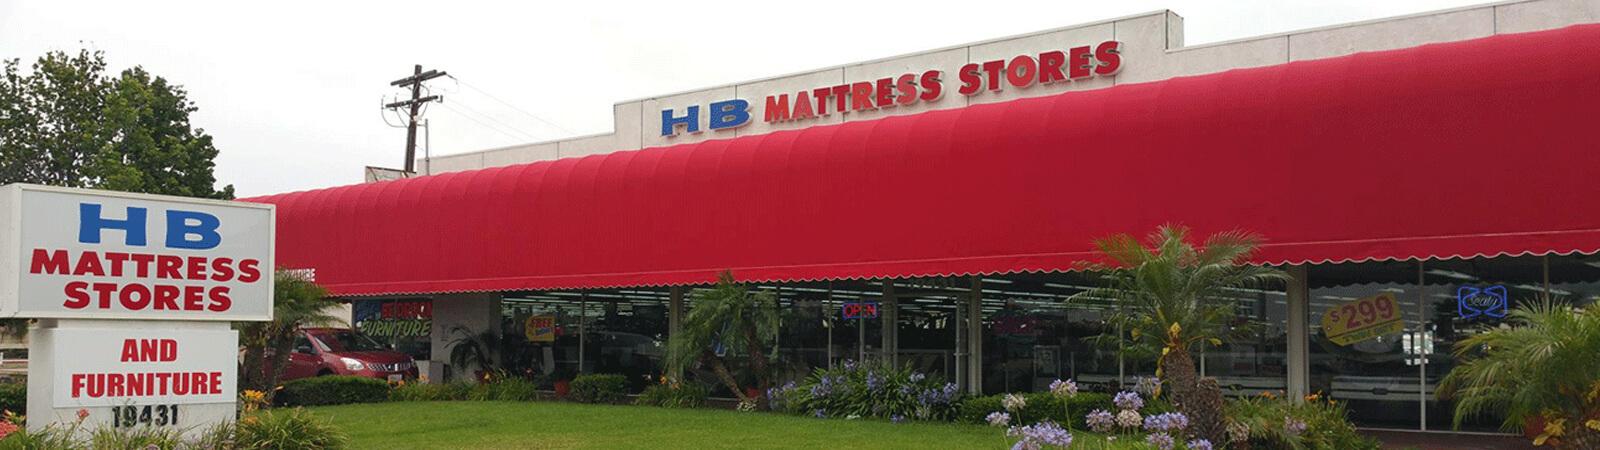 HB MATTRESS STORE